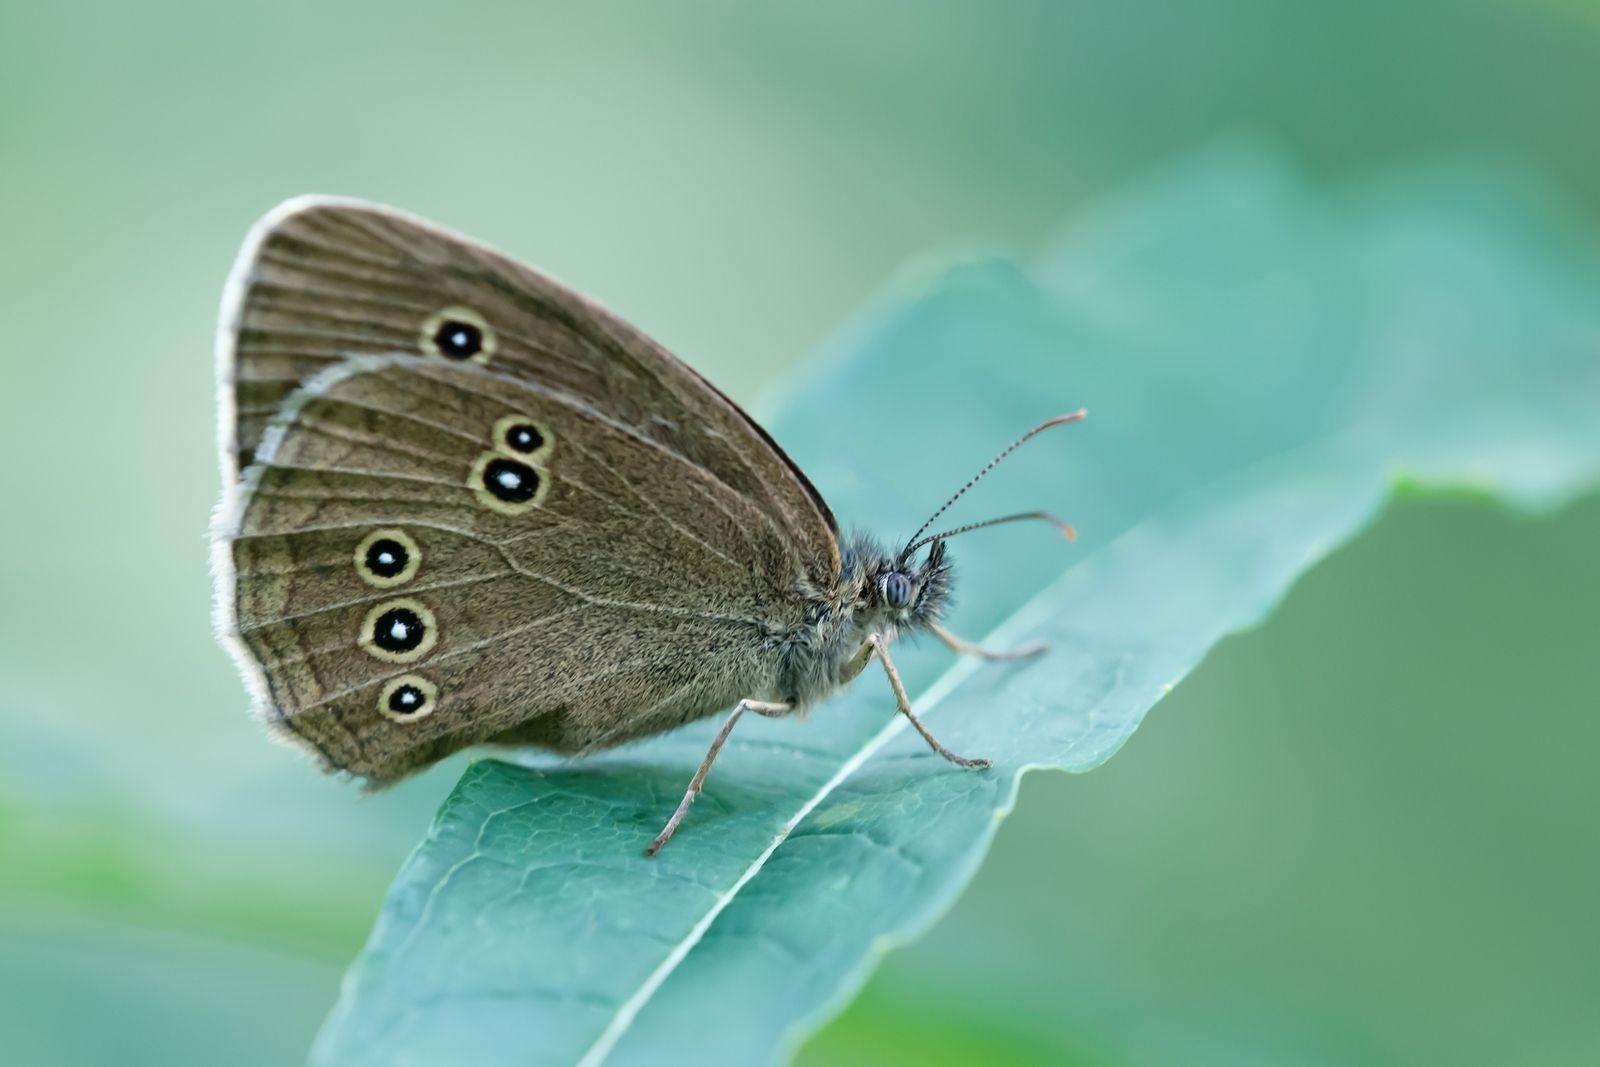 На отдахе. Макро бабочка фото бабочки